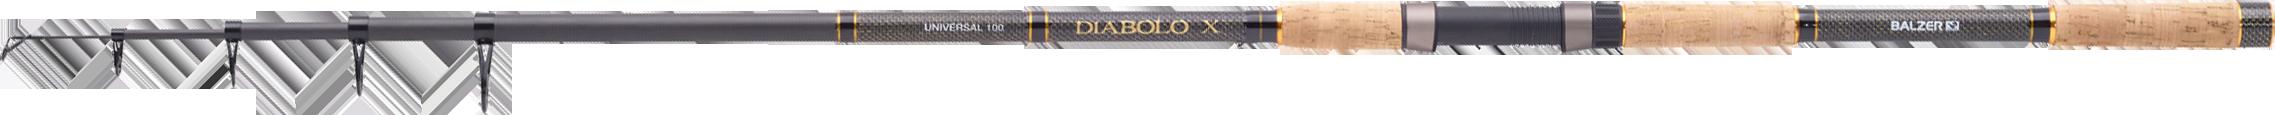 Diabolo X Tele Universal 100